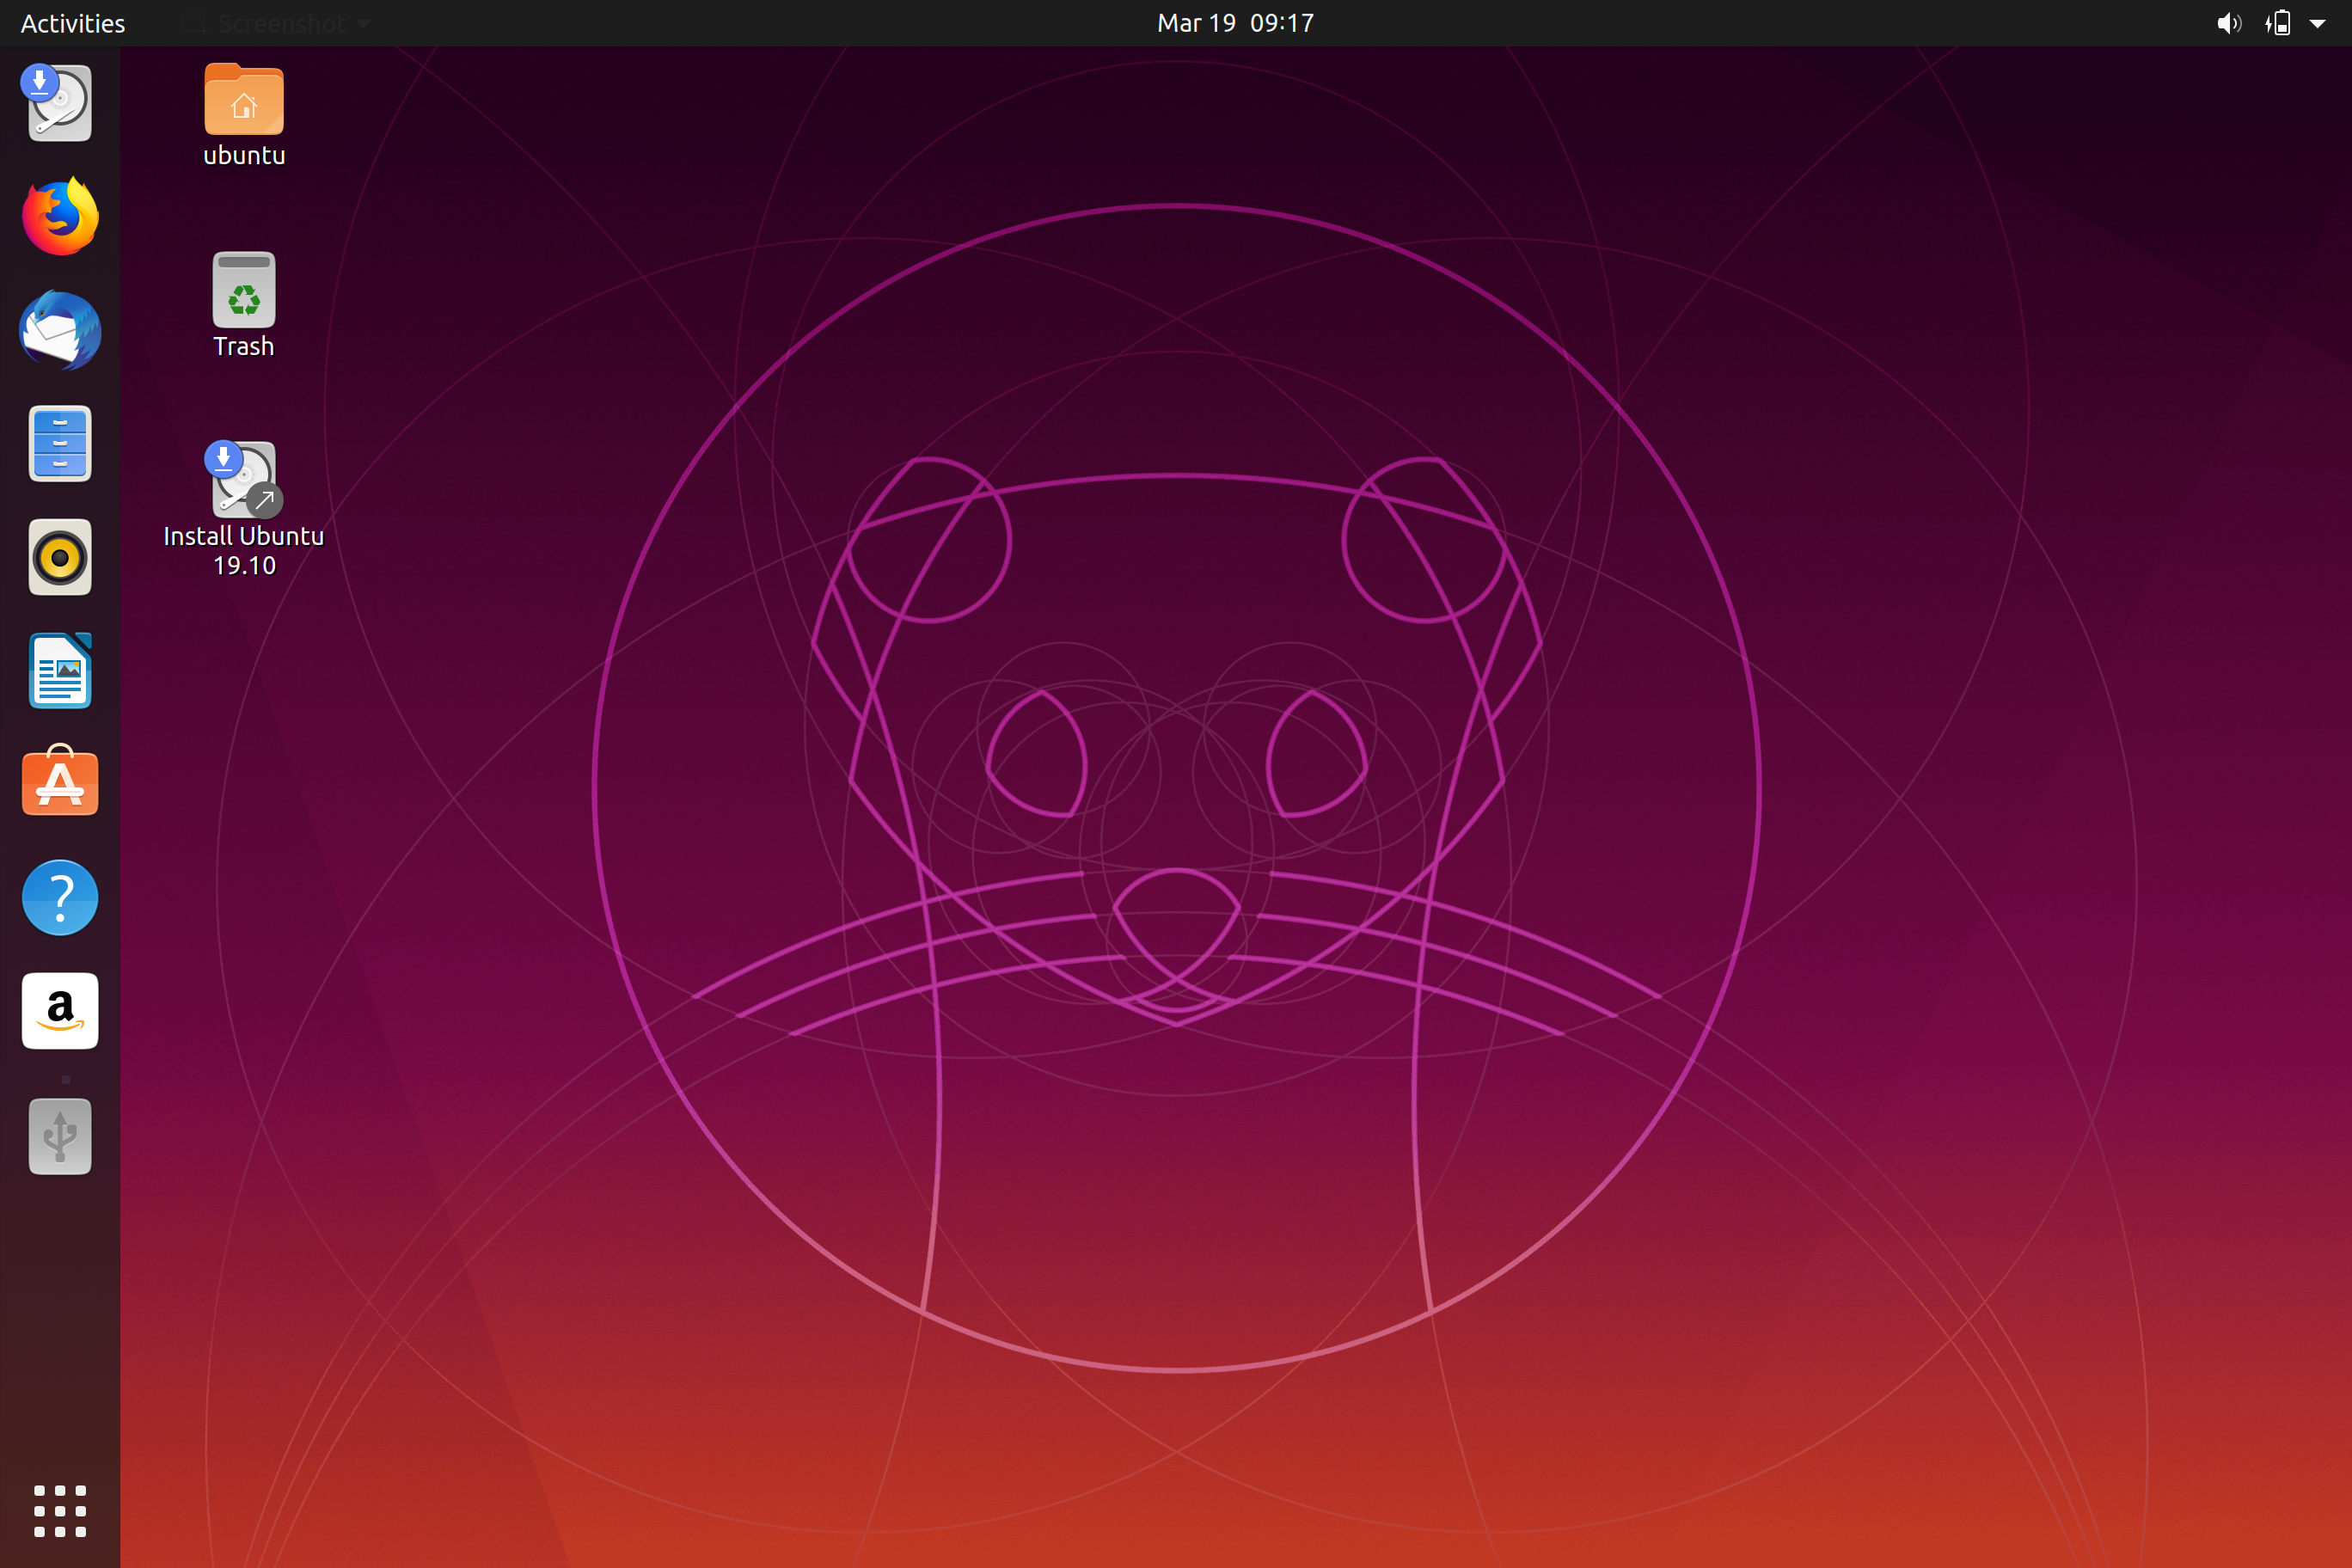 Установка Ubuntu на Microsoft Surface Pro — IT-МИР. ПОМОЩЬ В IT-МИРЕ 2021